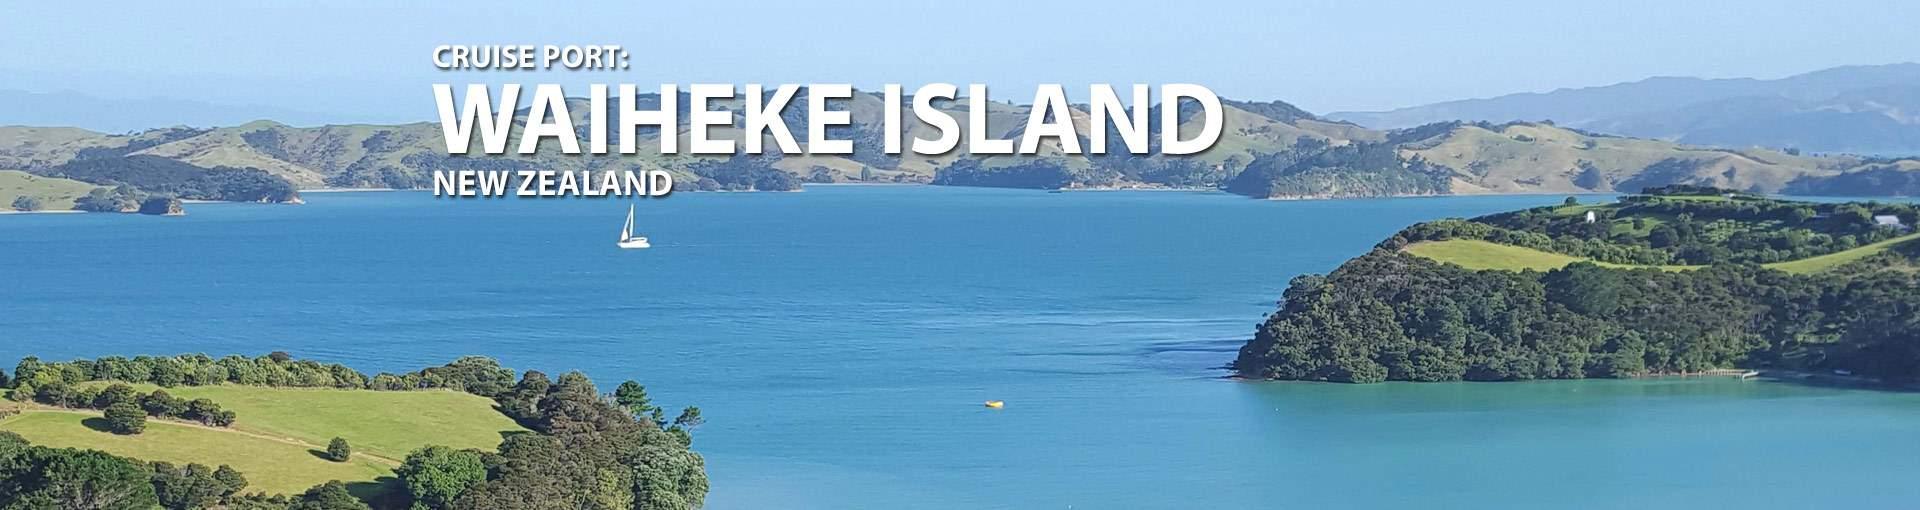 Waiheke Island, New Zealand Cruise Port